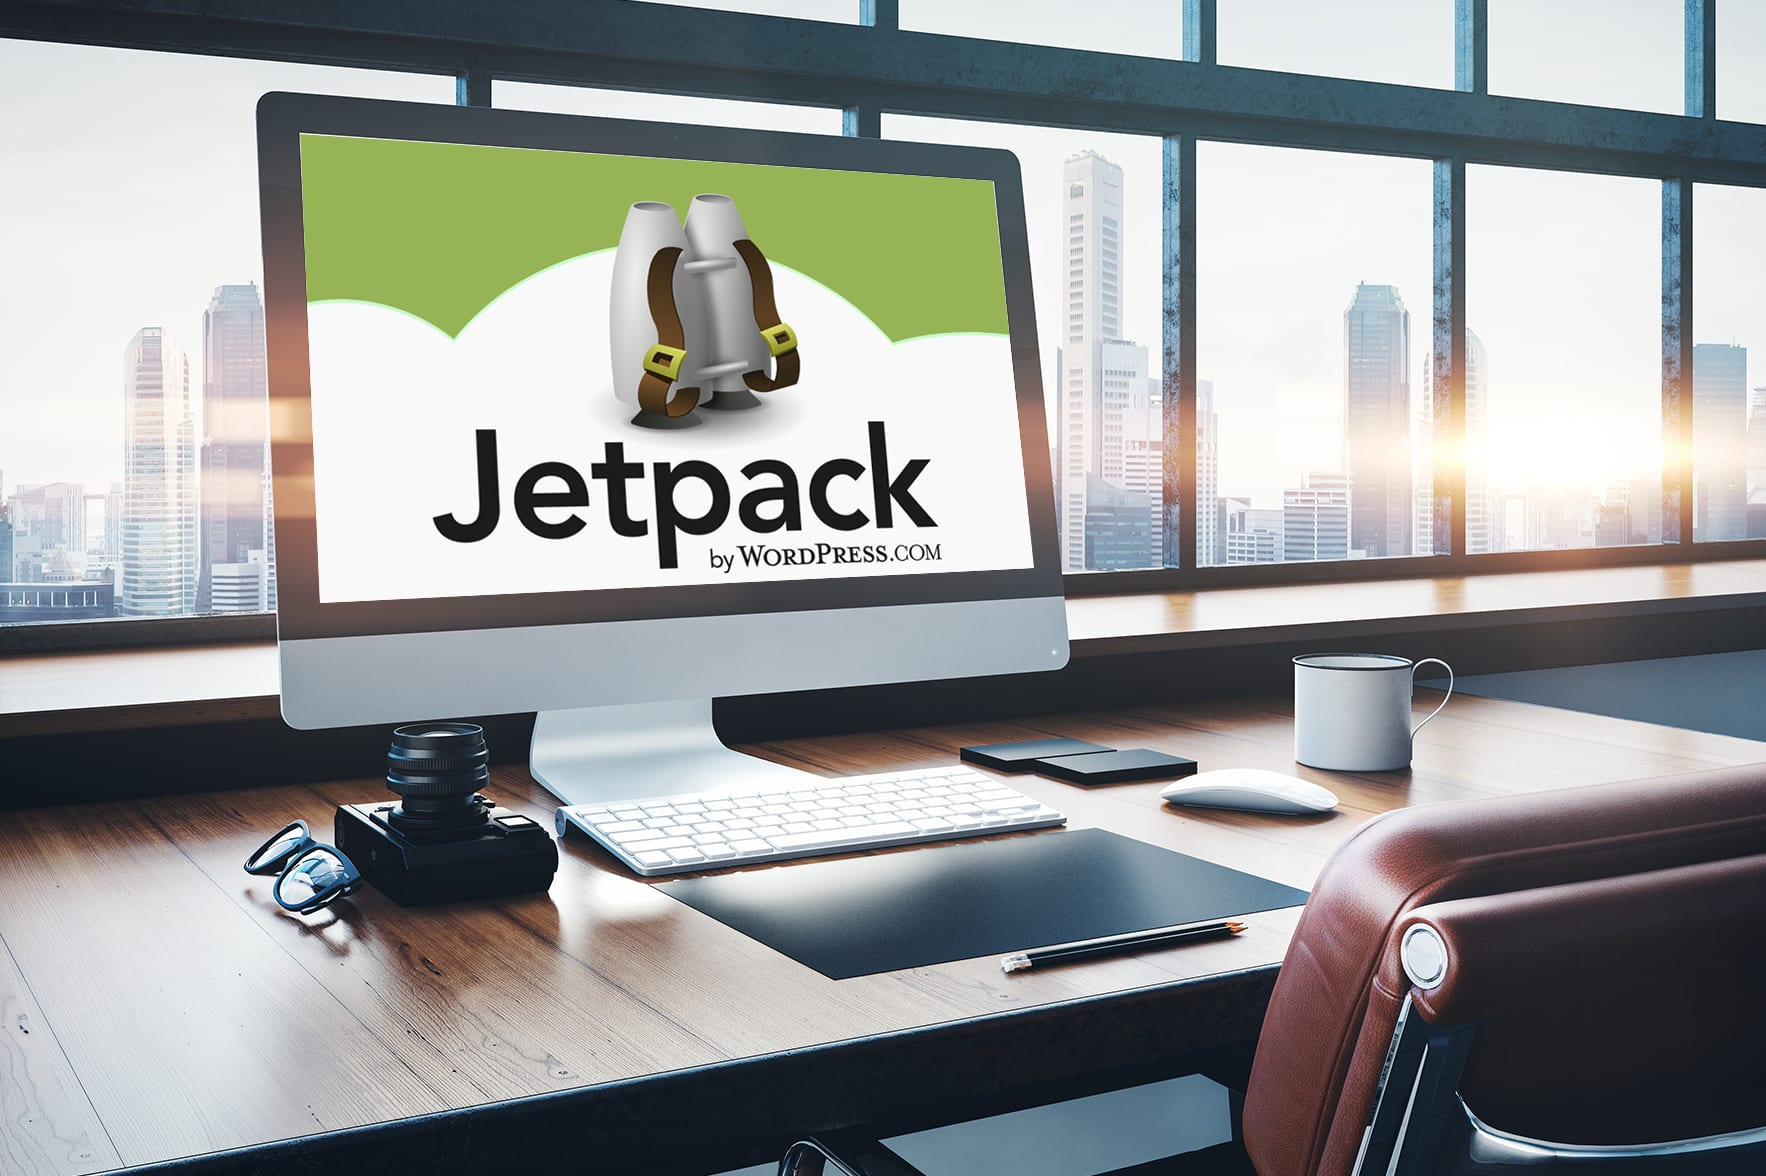 wordpress jetpack plugin